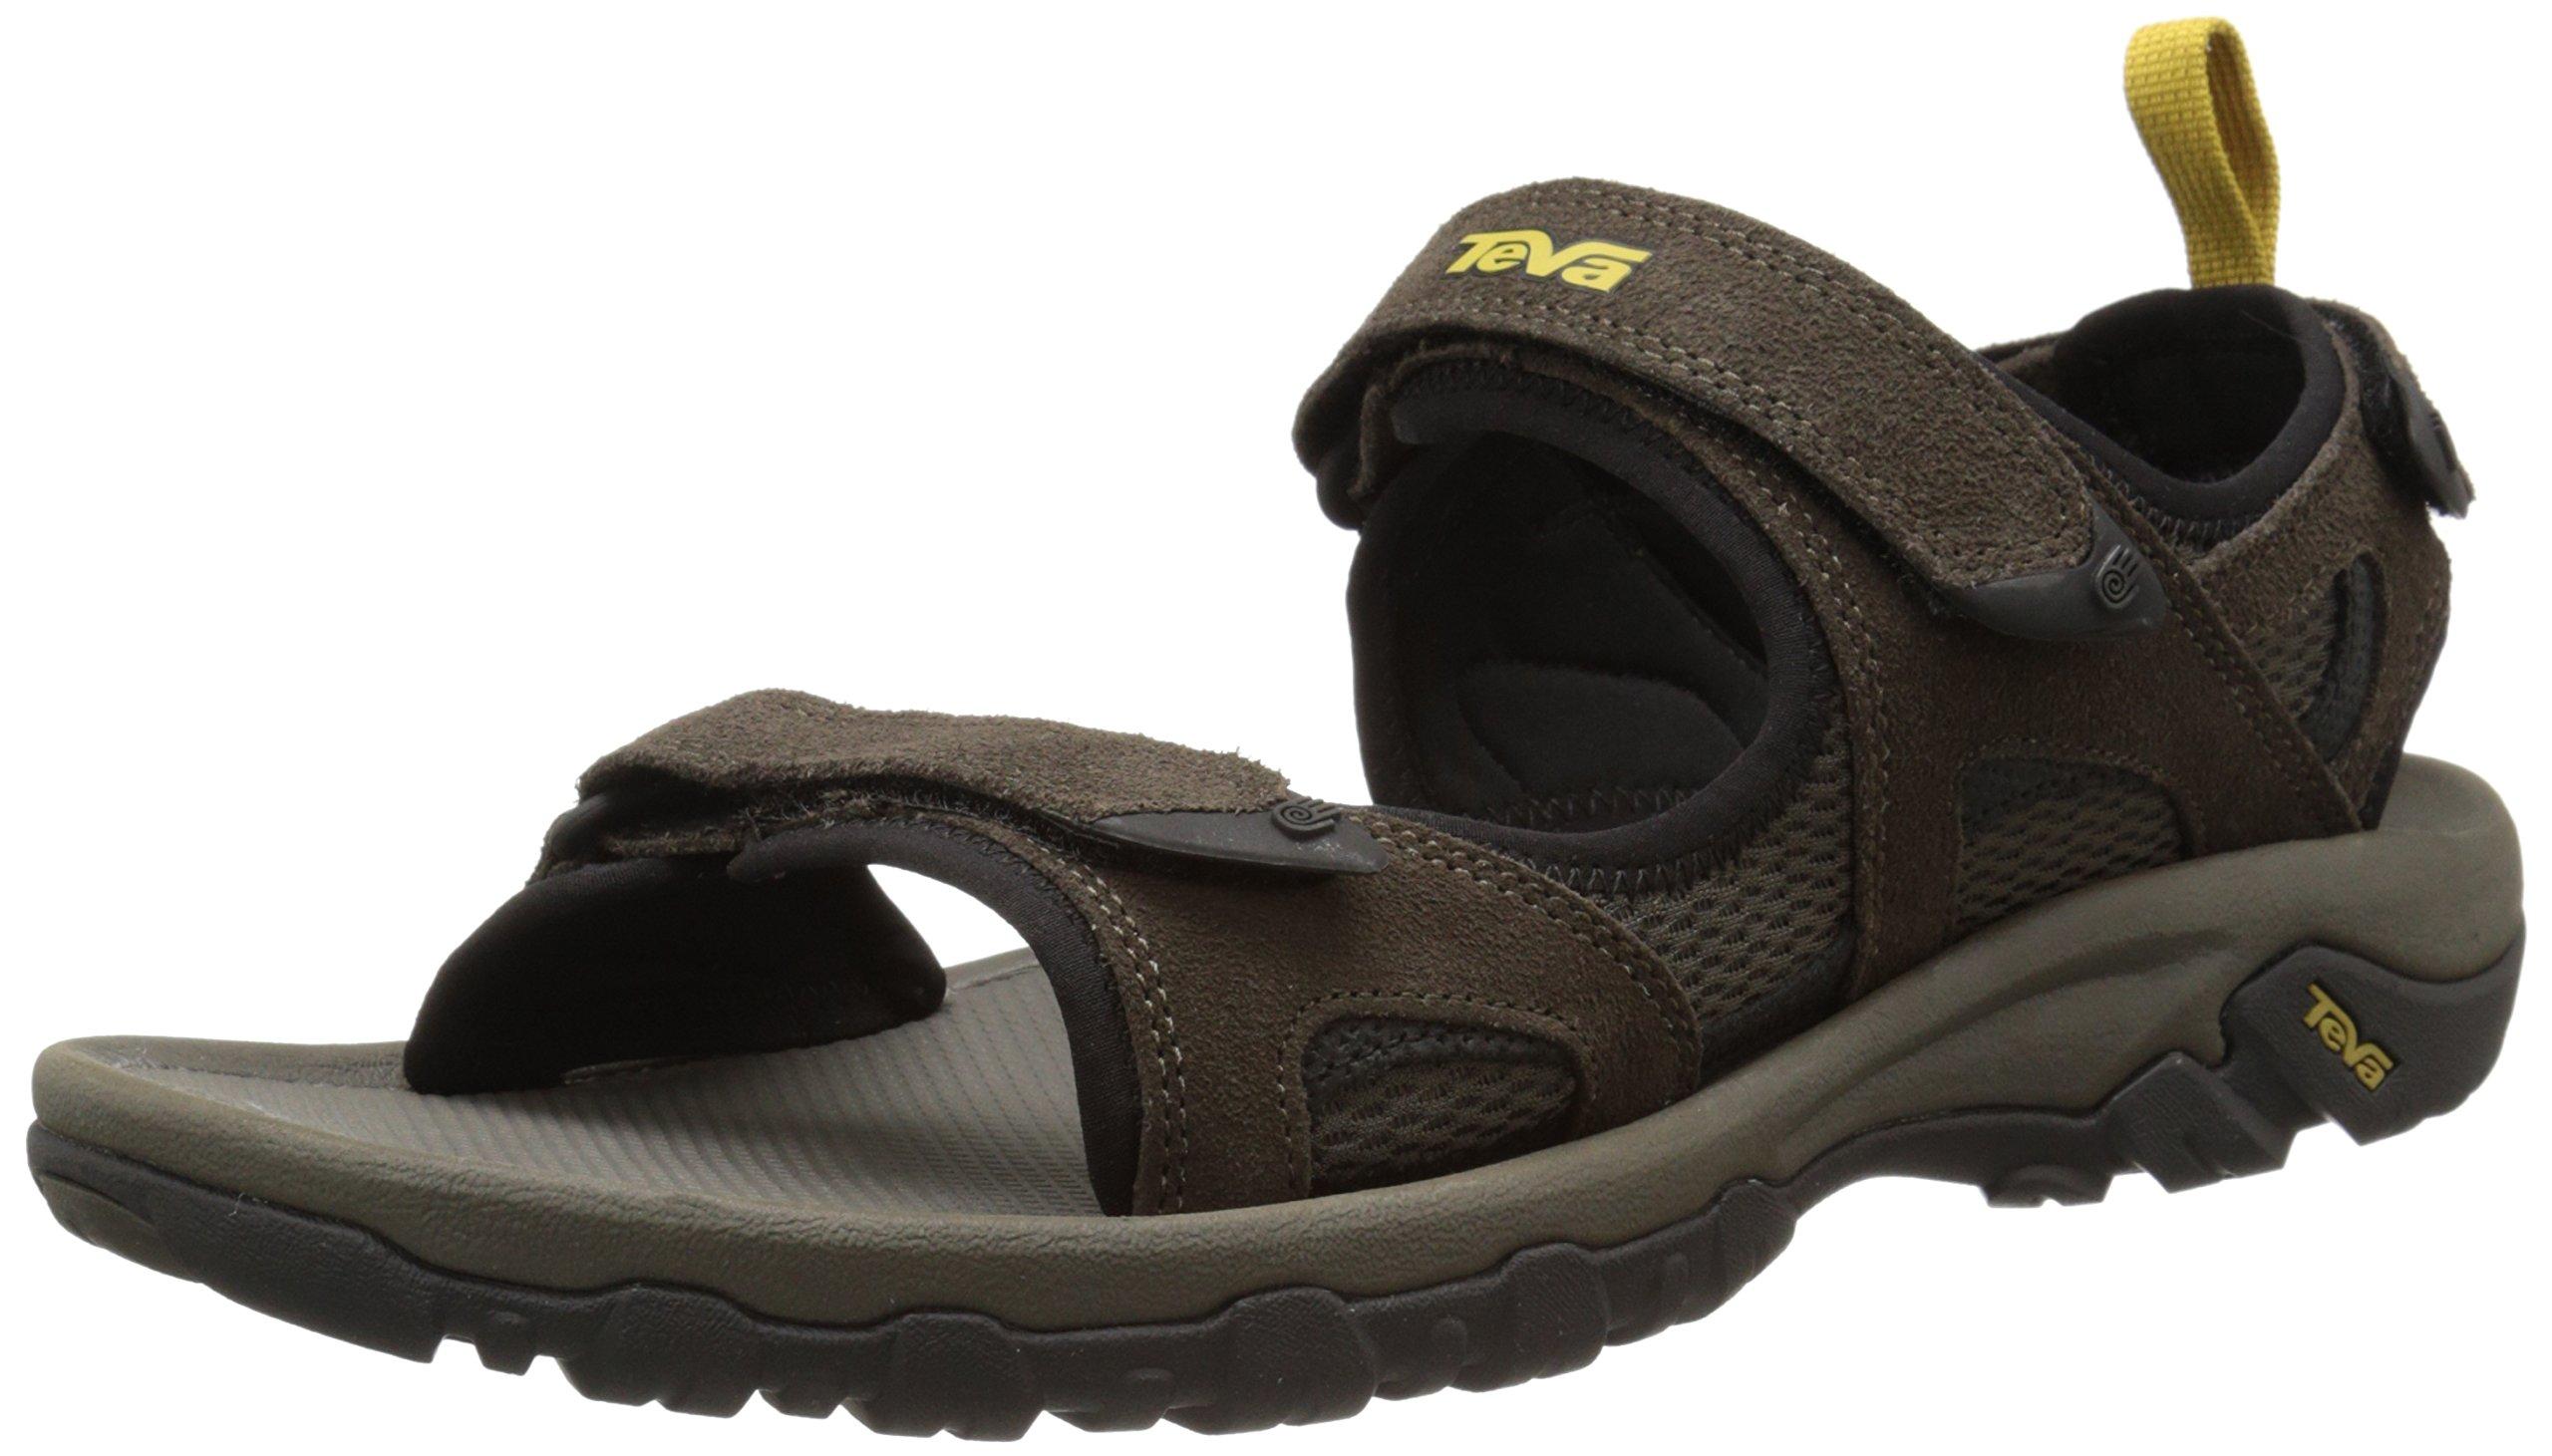 Teva Men's Katavi Outdoor Sandal,Brown,9 M US by Teva